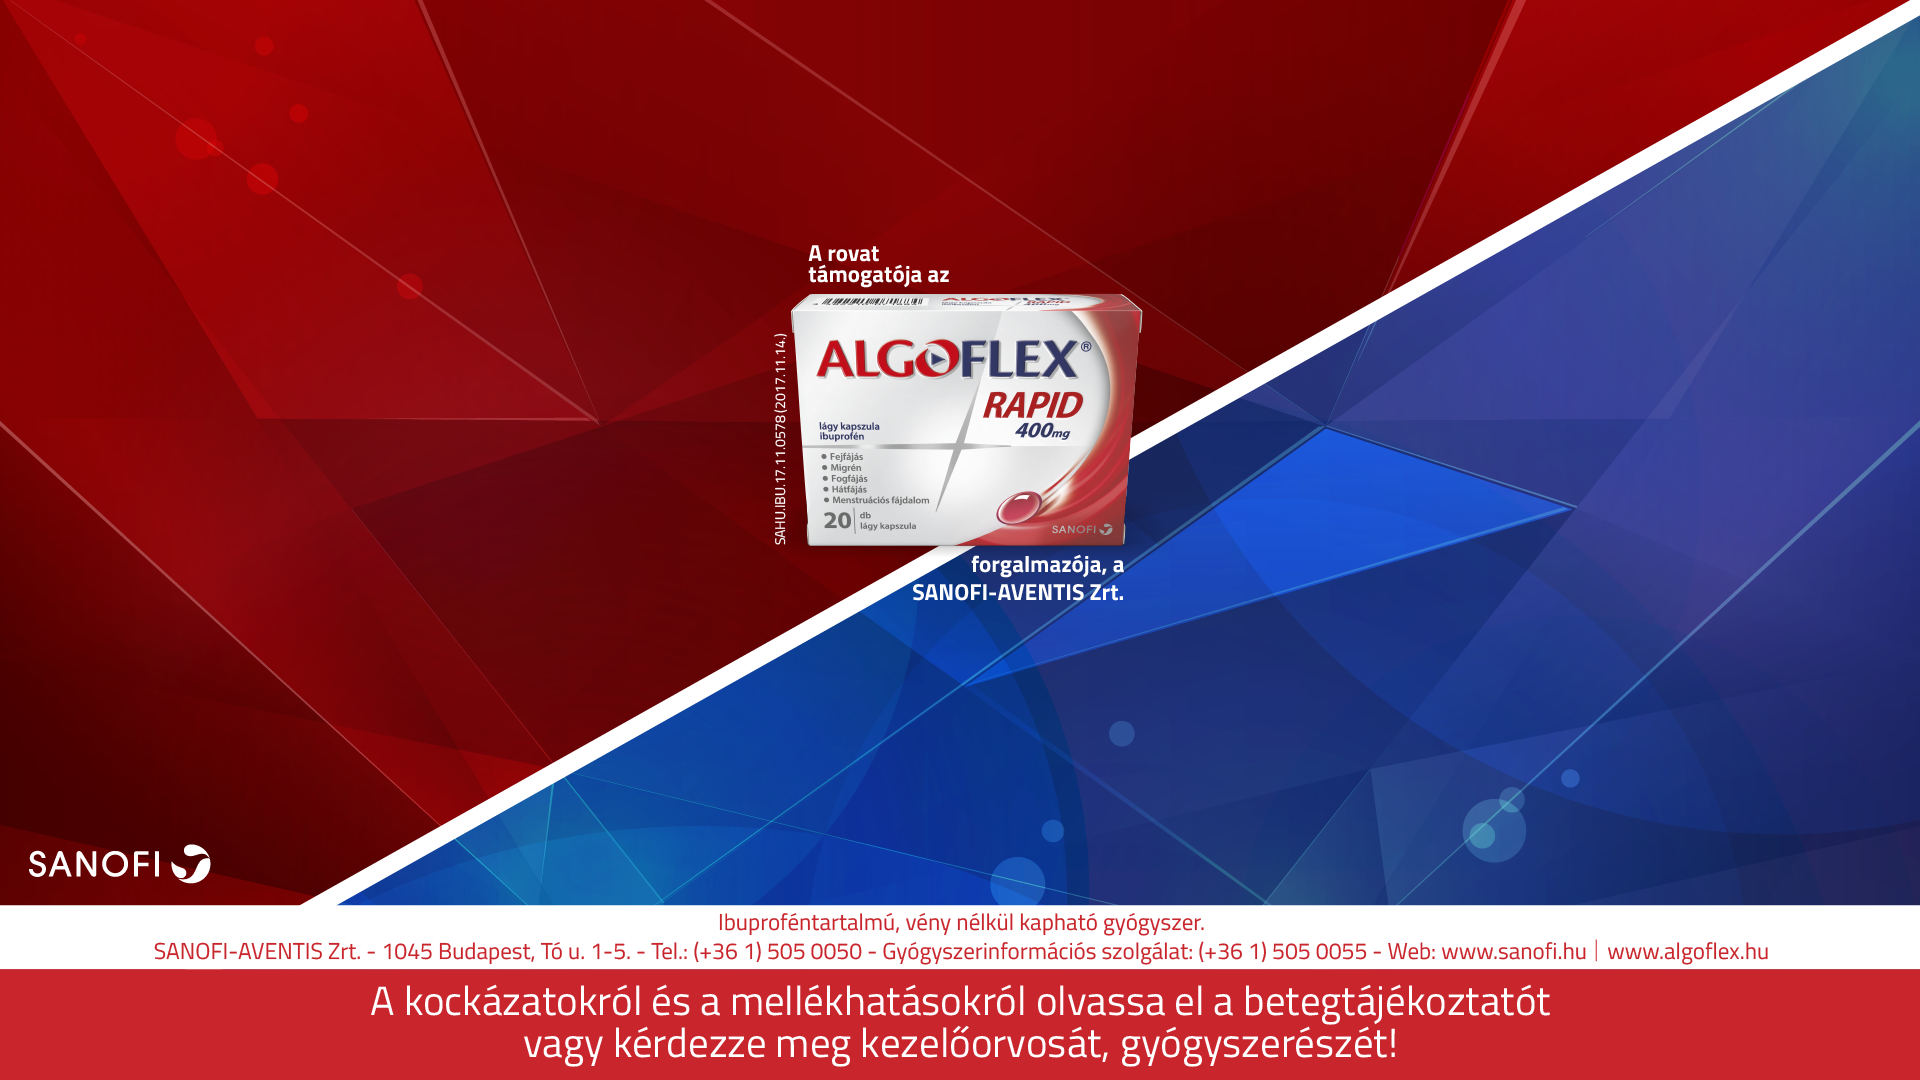 sanofialgoflex background